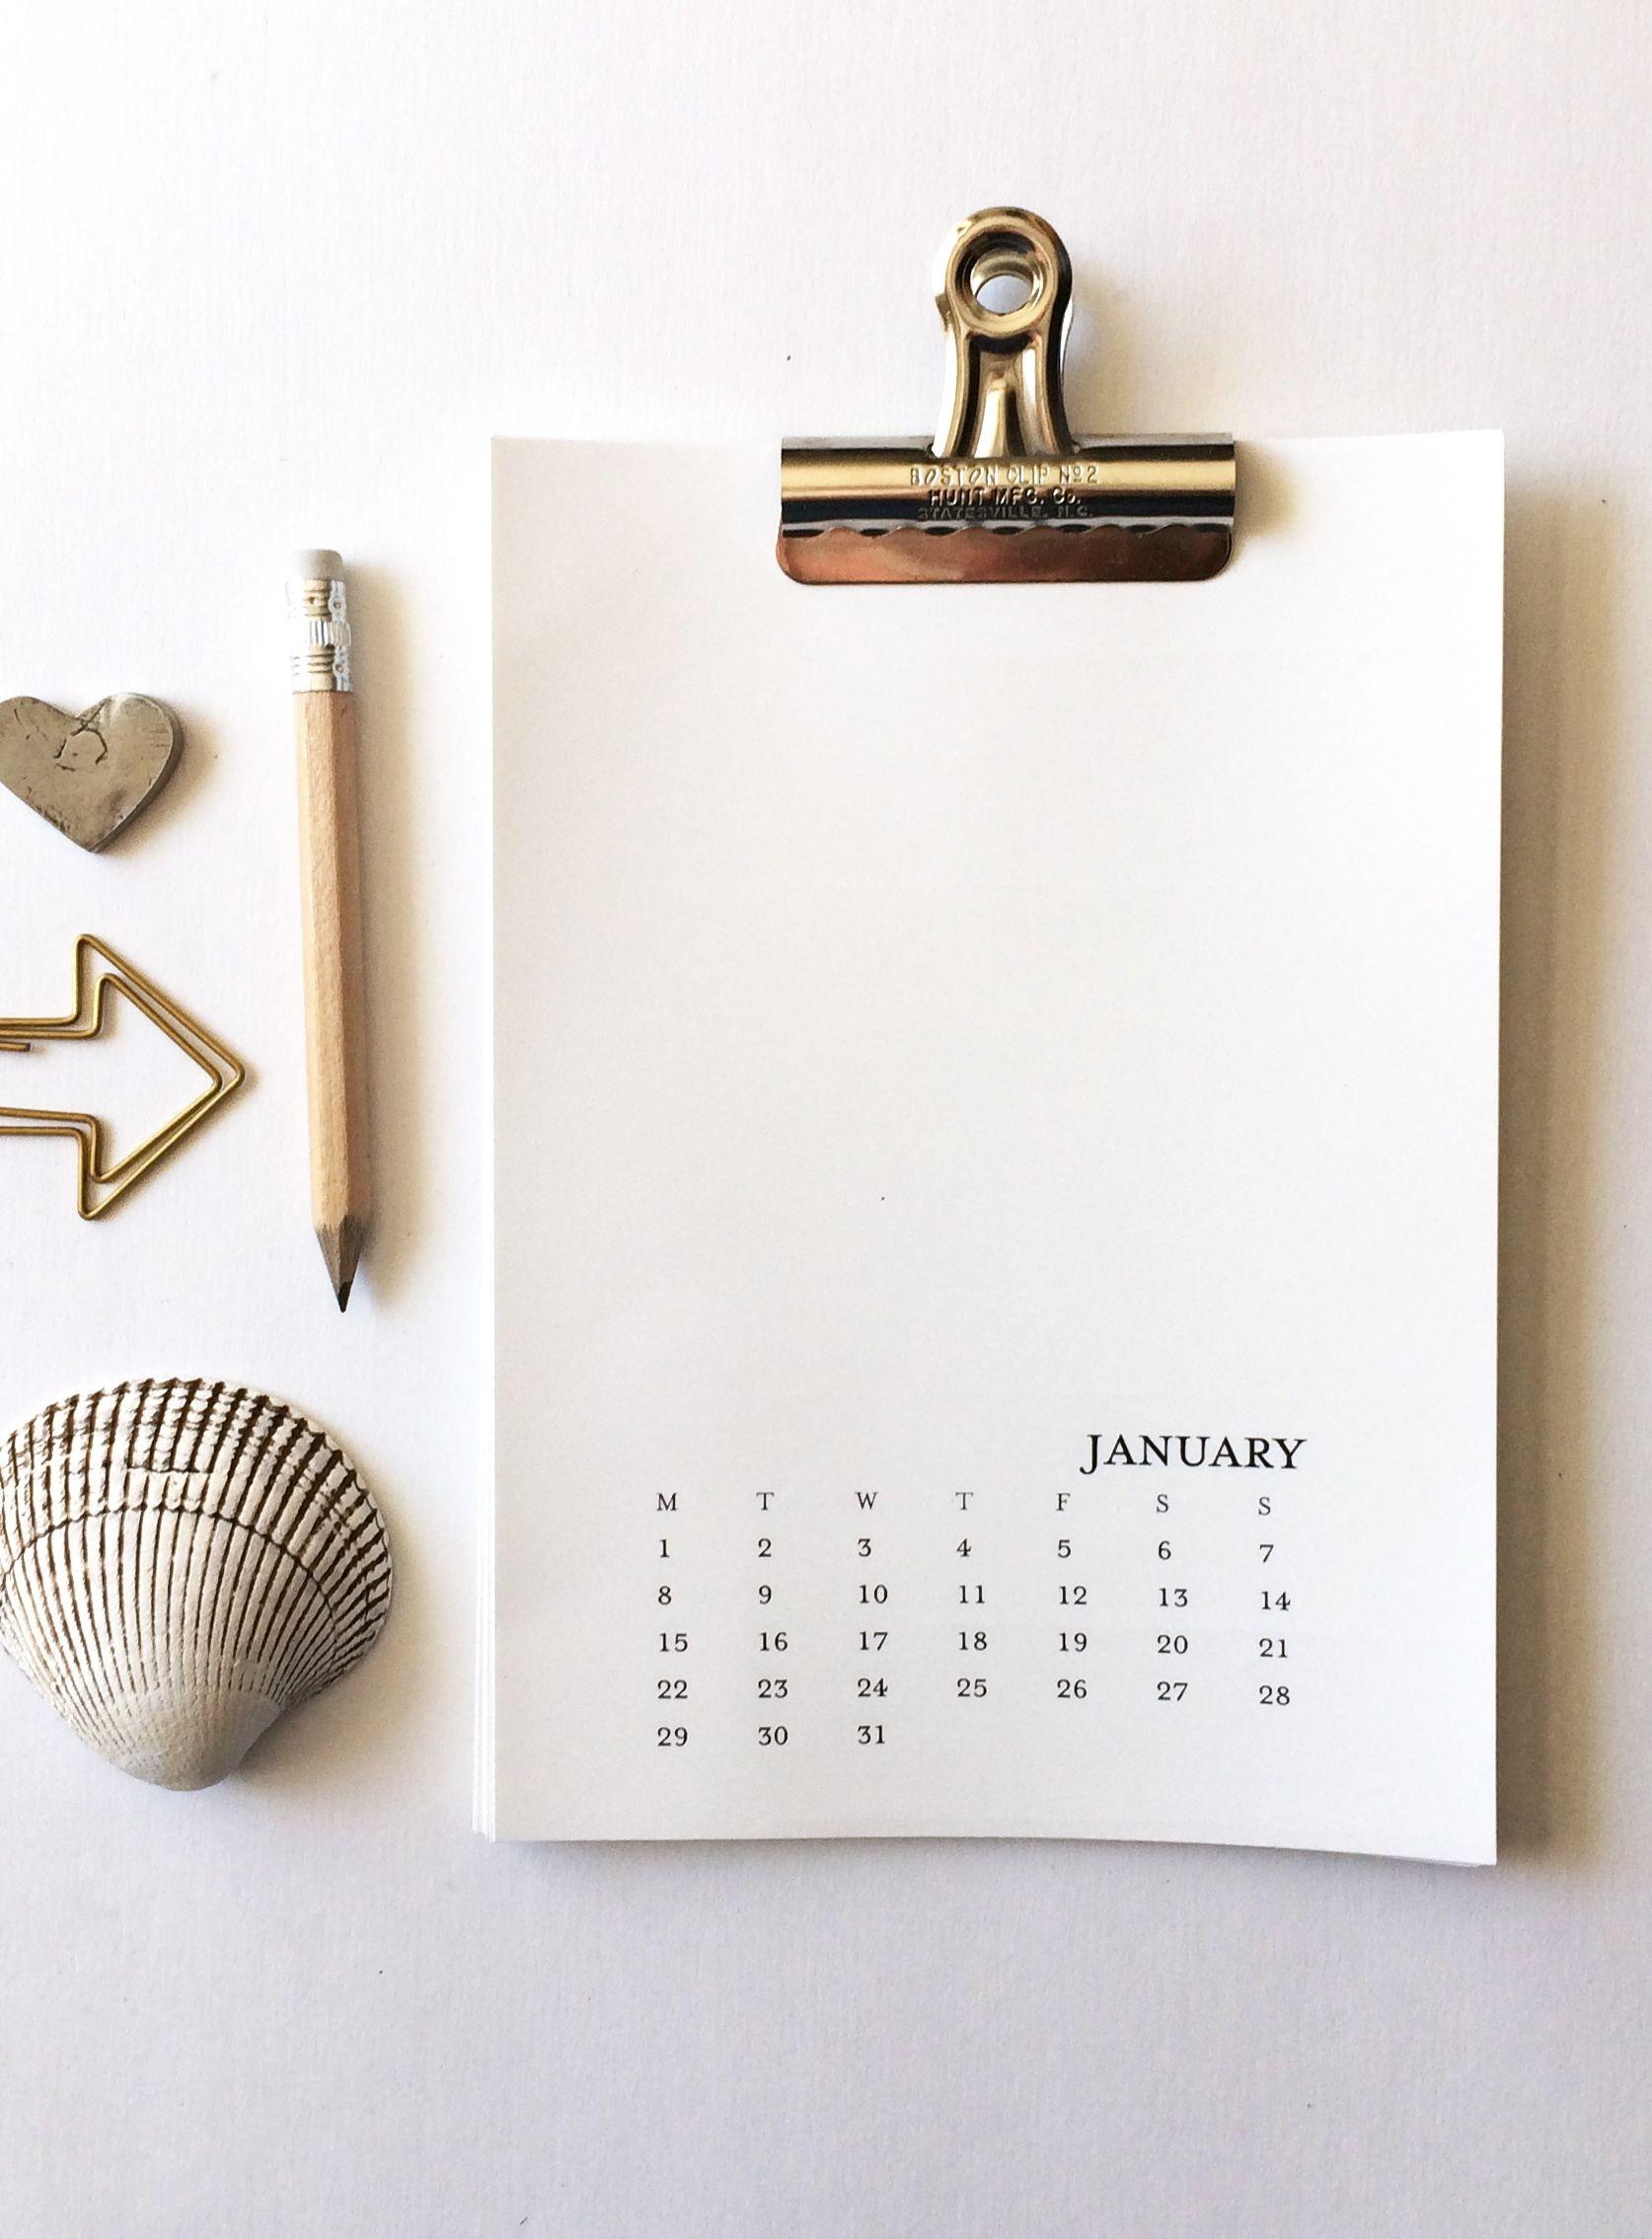 2020 Printable Calendar 5X7 Monday-Sunday - Printable-Blank 2020 W 9